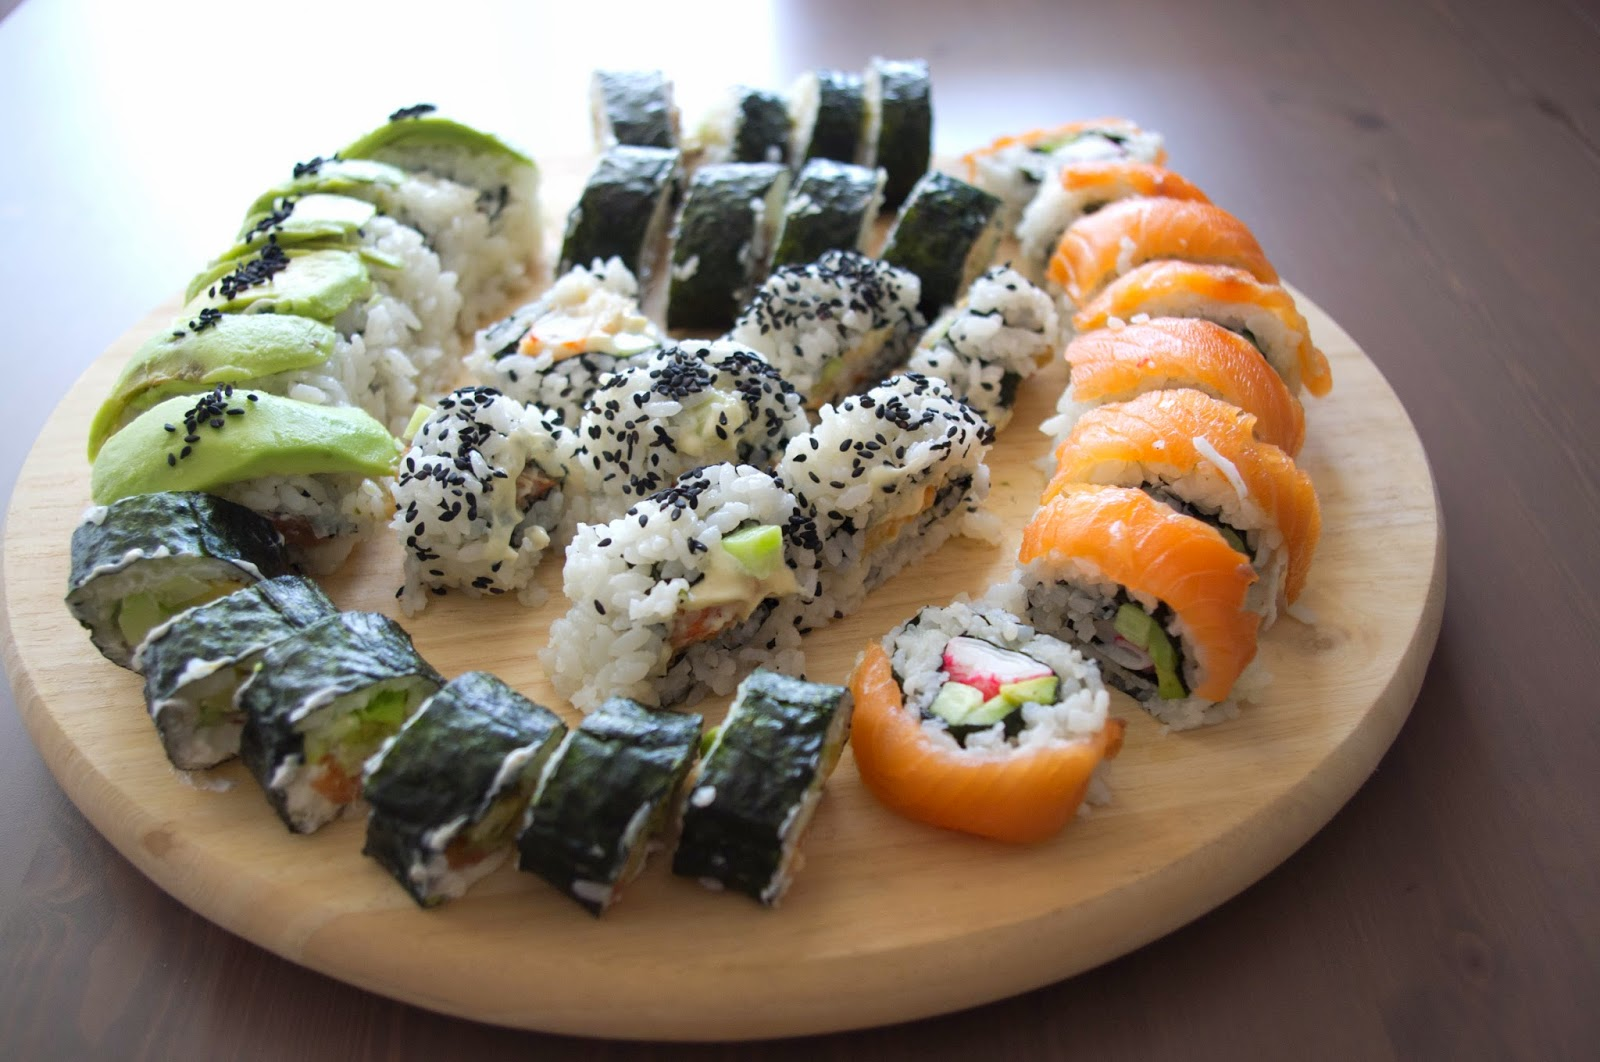 http://mojemenu.blogspot.com/2014/09/uczta-sushi.html